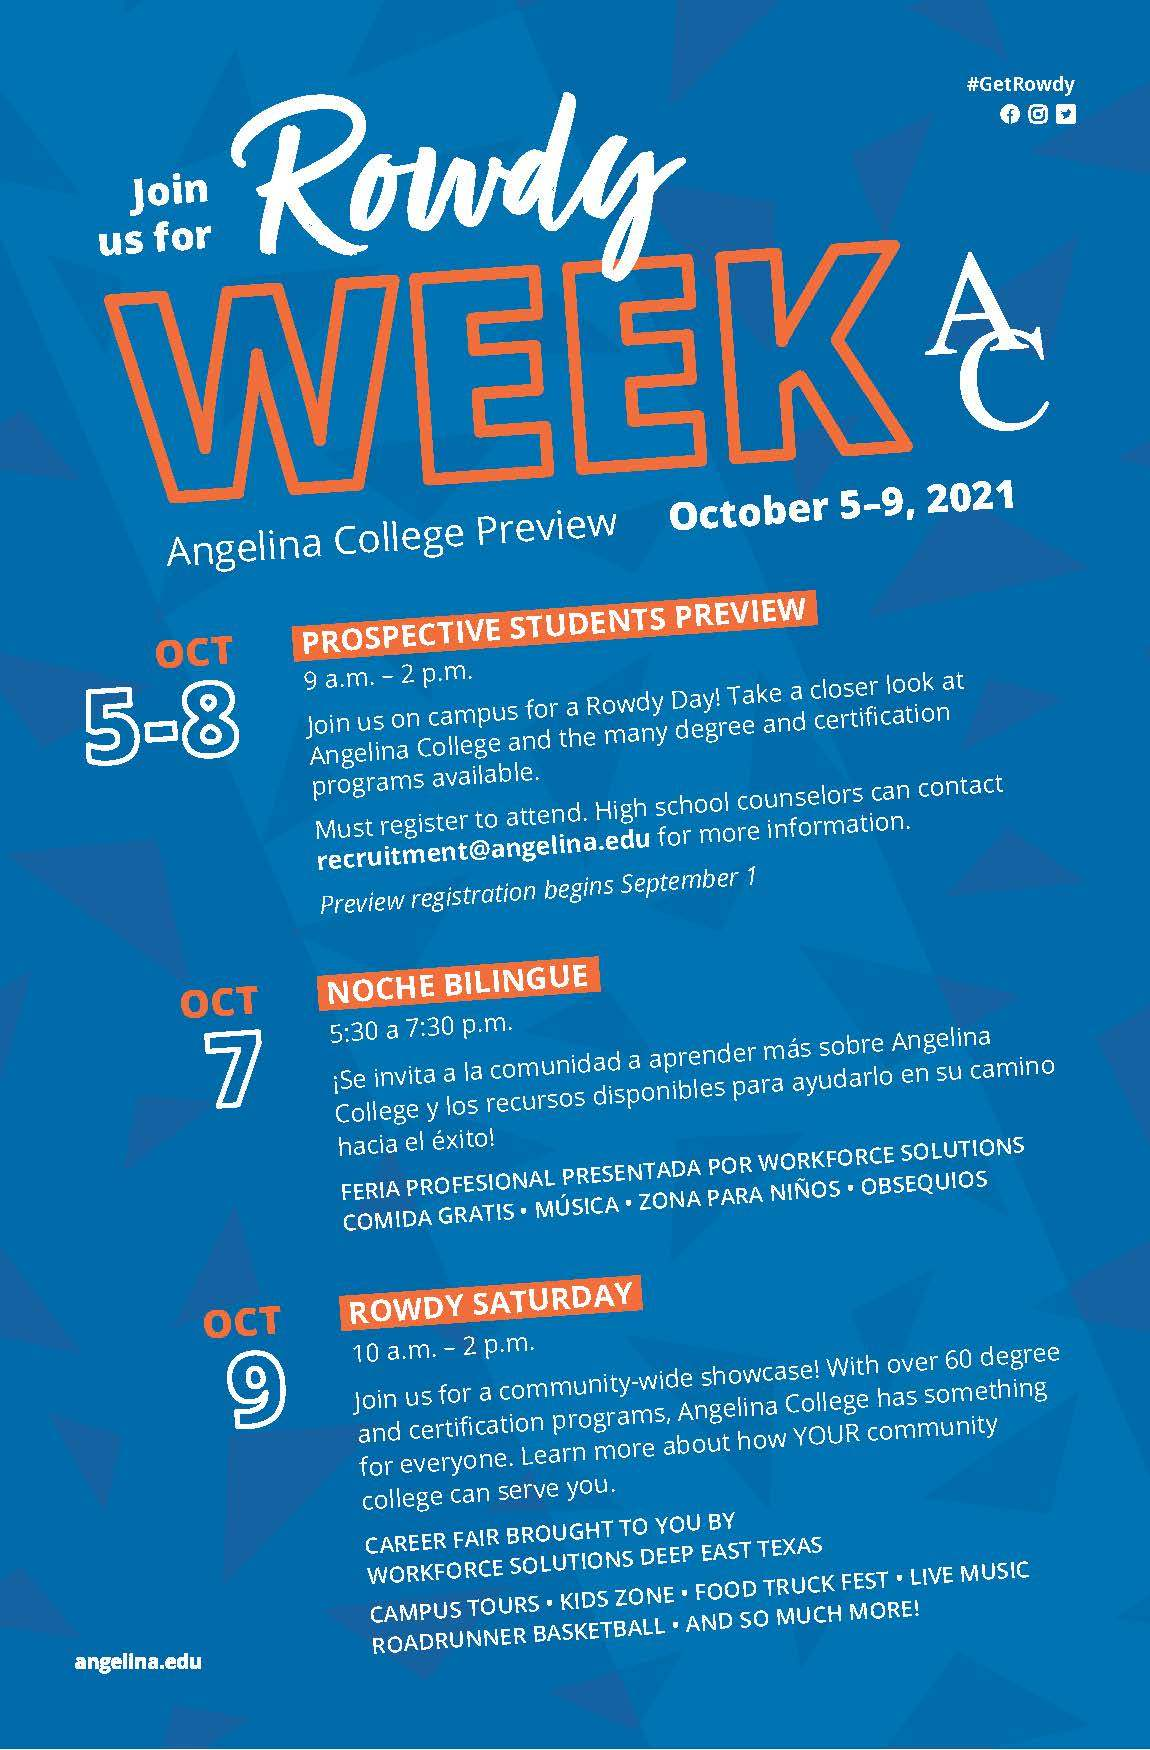 Angelina College Rowdy Week Career Fair 2021